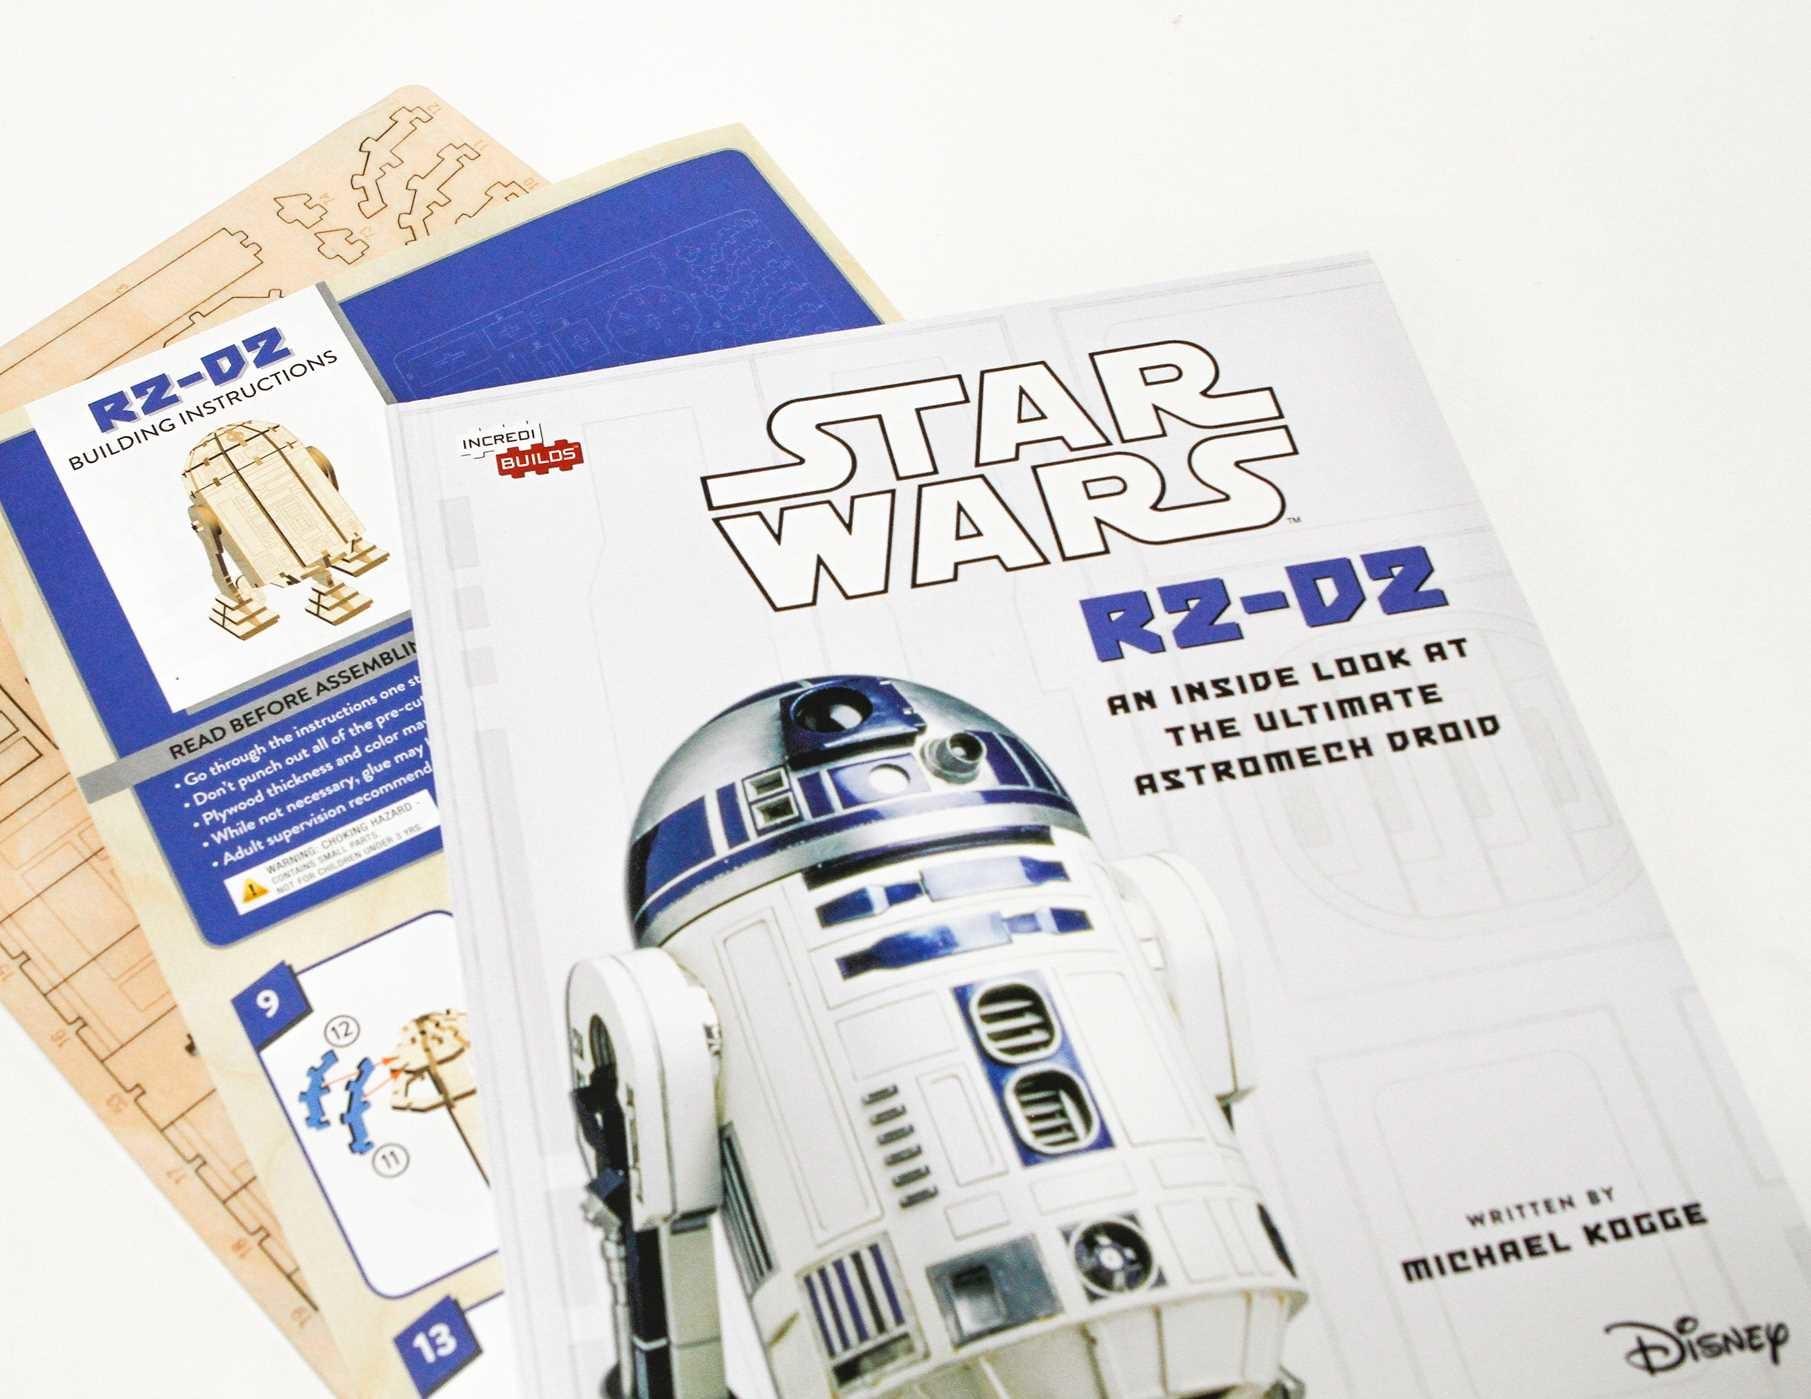 Incredibuilds star wars r2 d2 3d wood model 9781682980279.in05